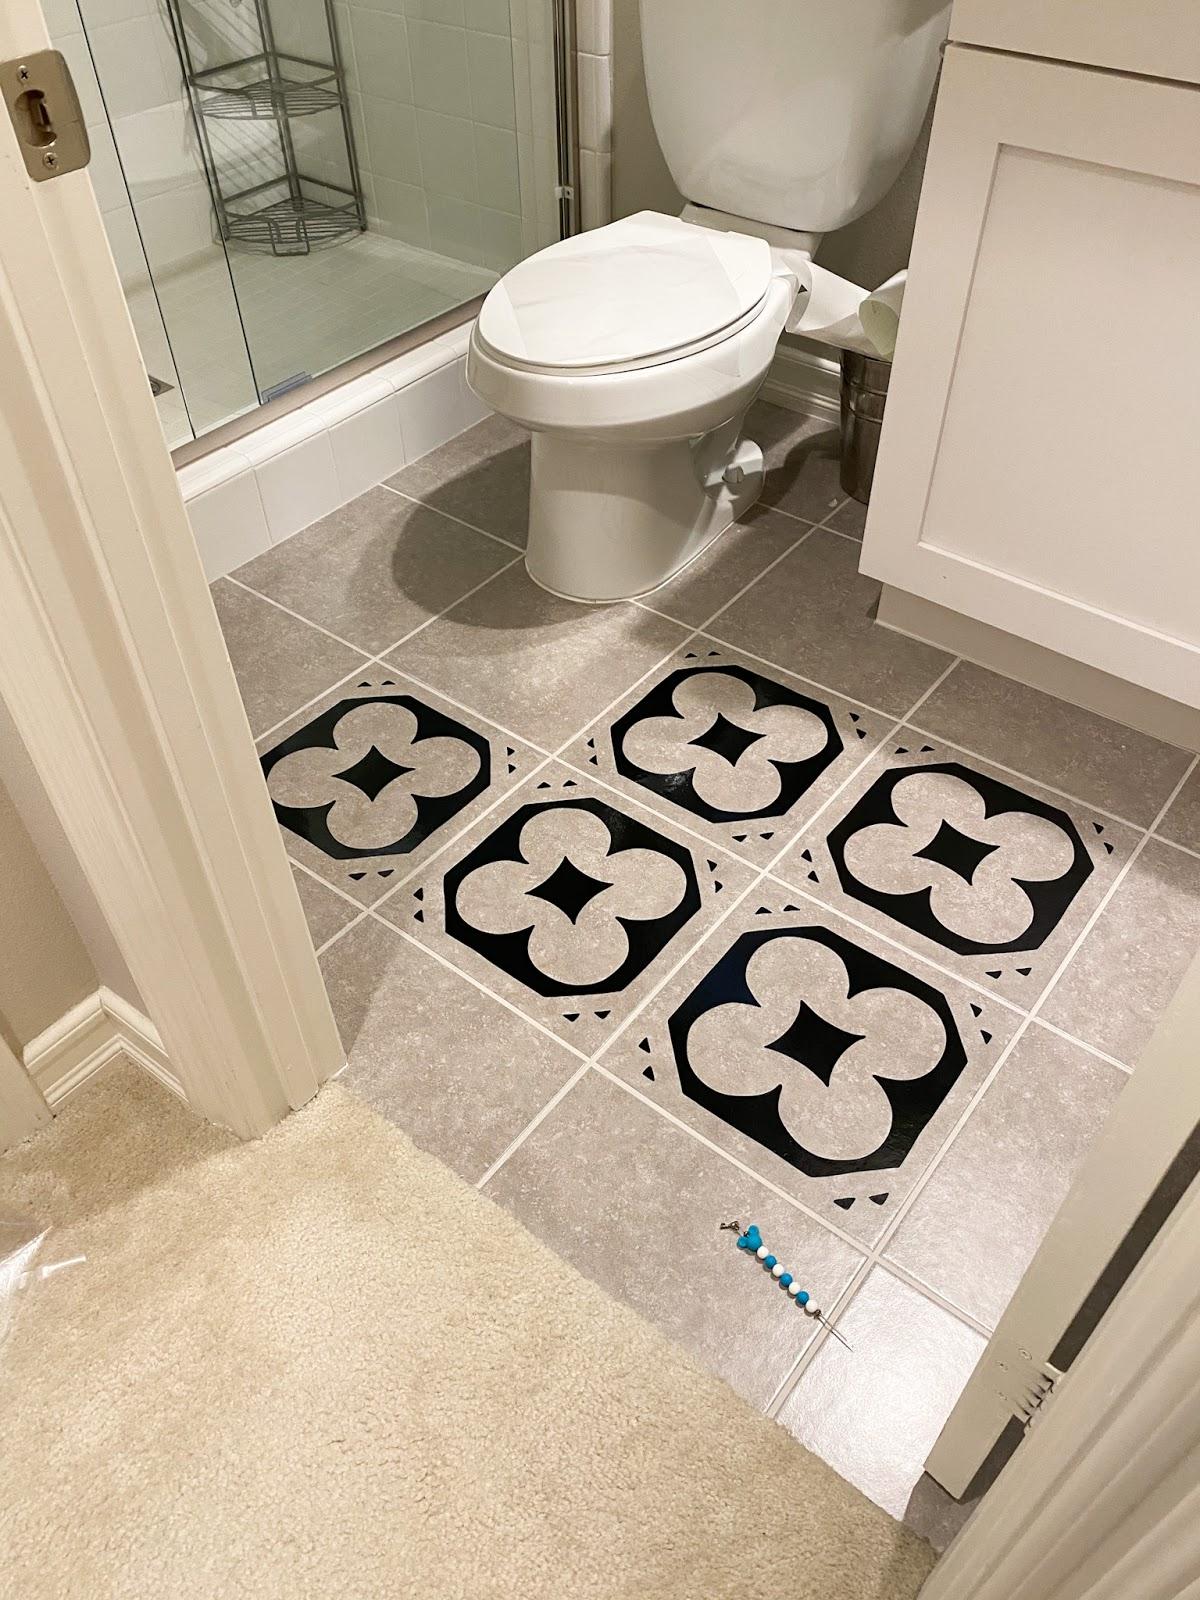 Add Vinyl To Floor Tiles For A